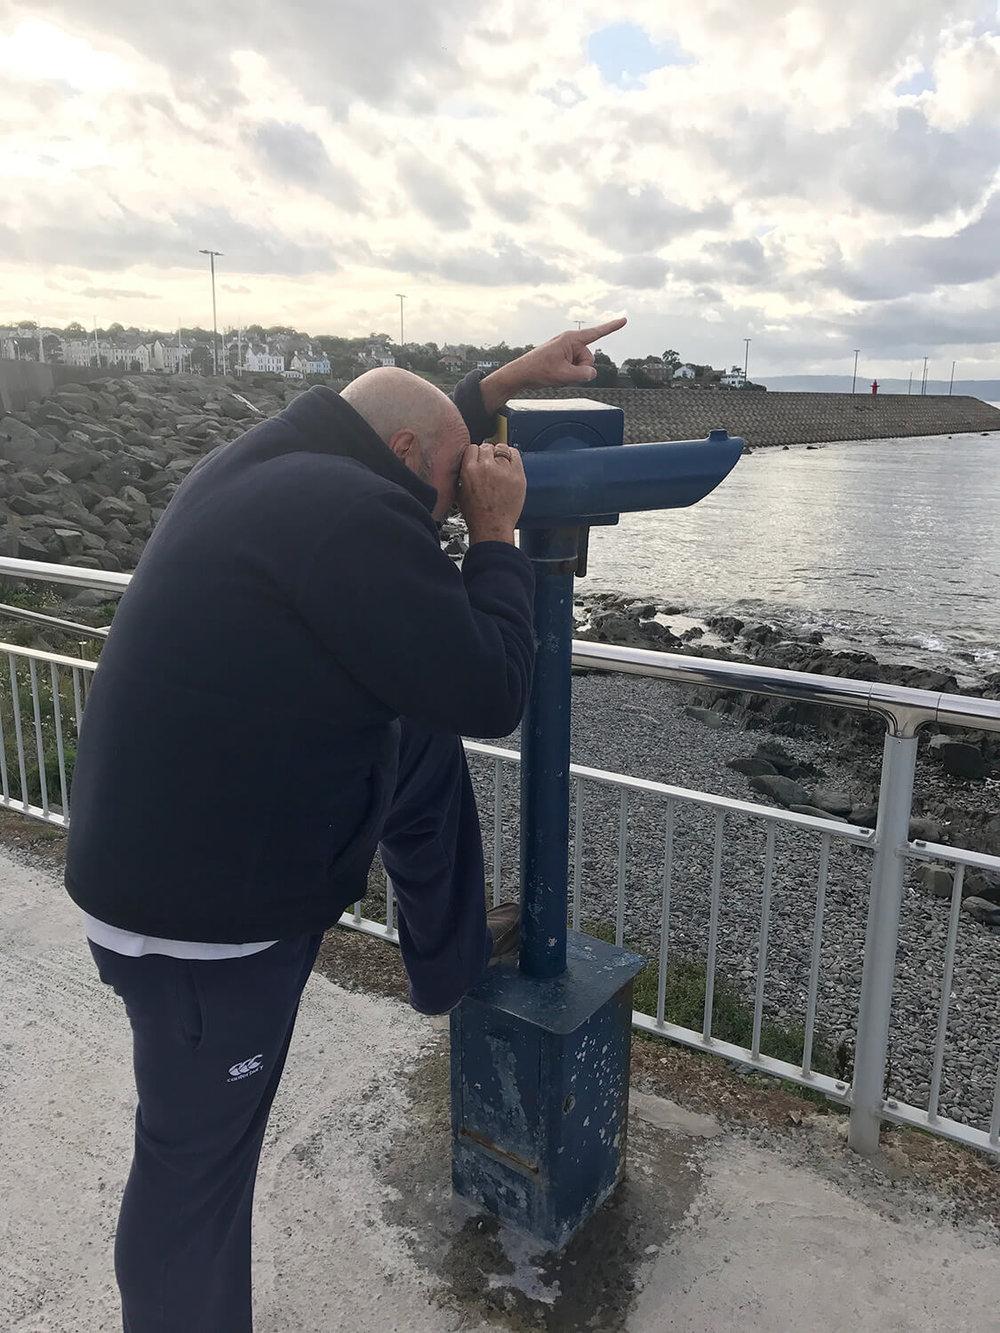 Scotland that way!